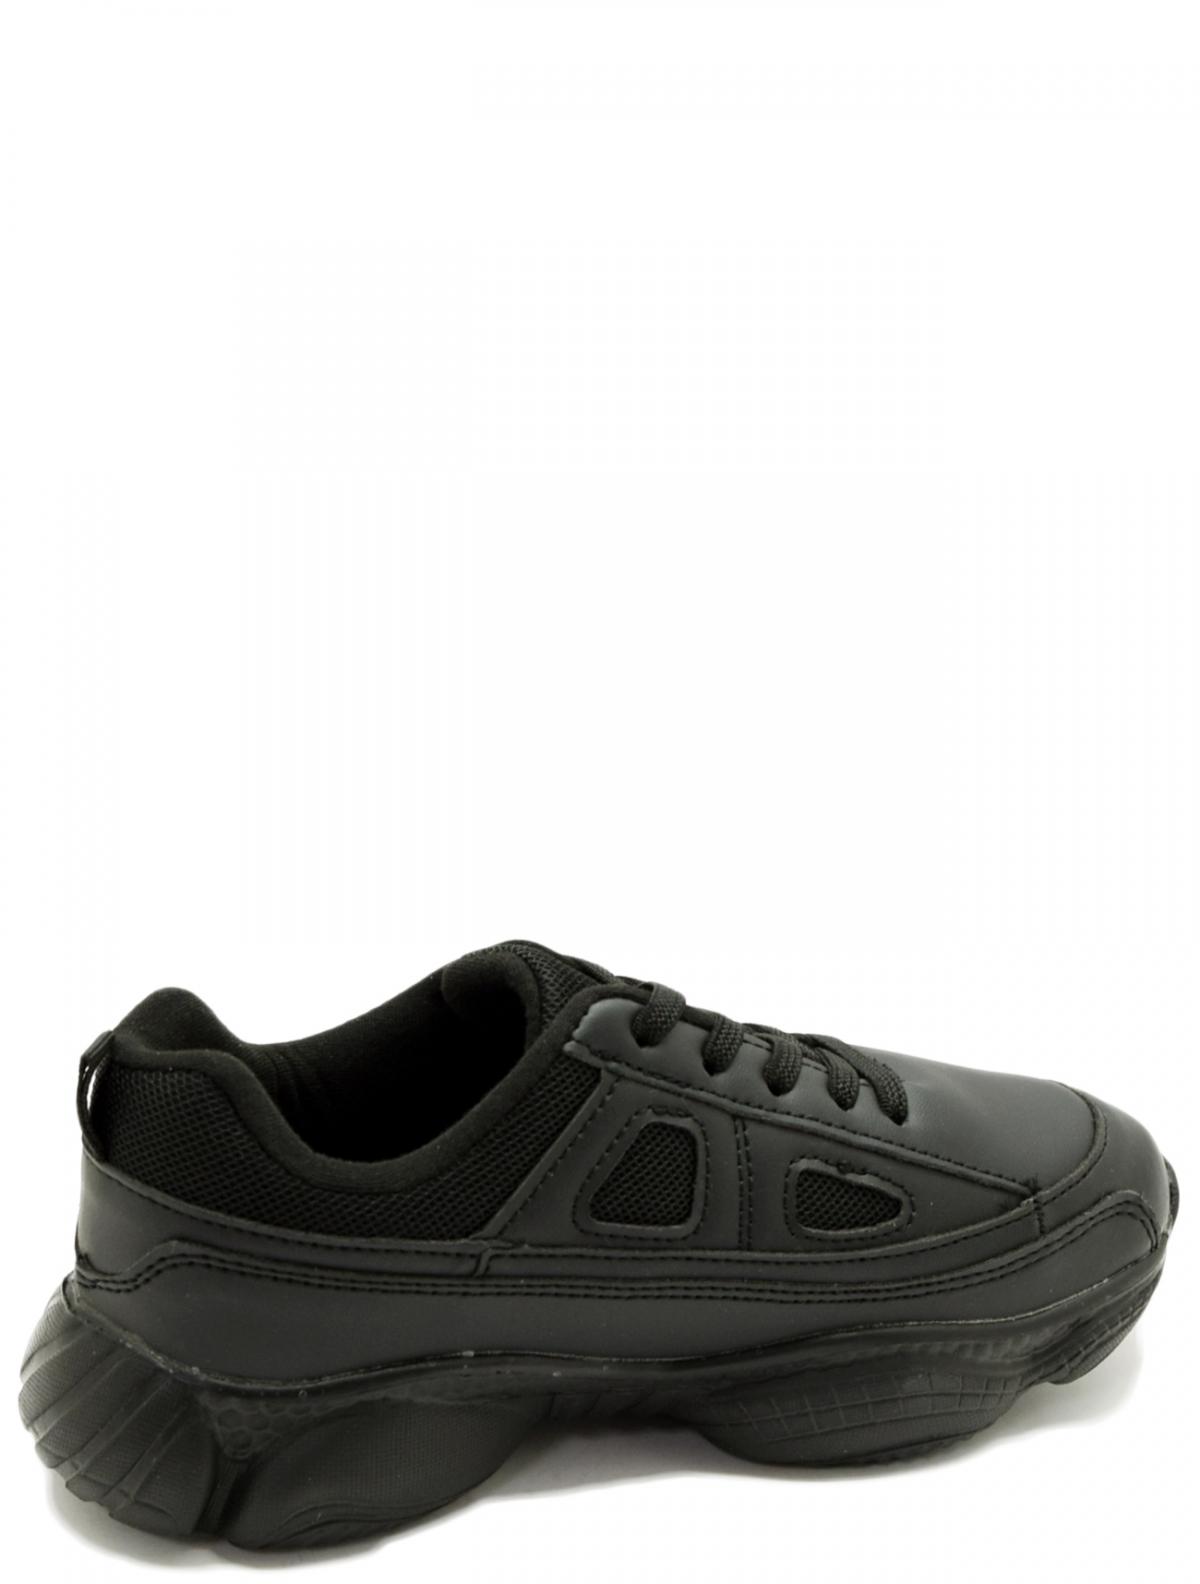 Trien T-A07 кроссовки для девочки